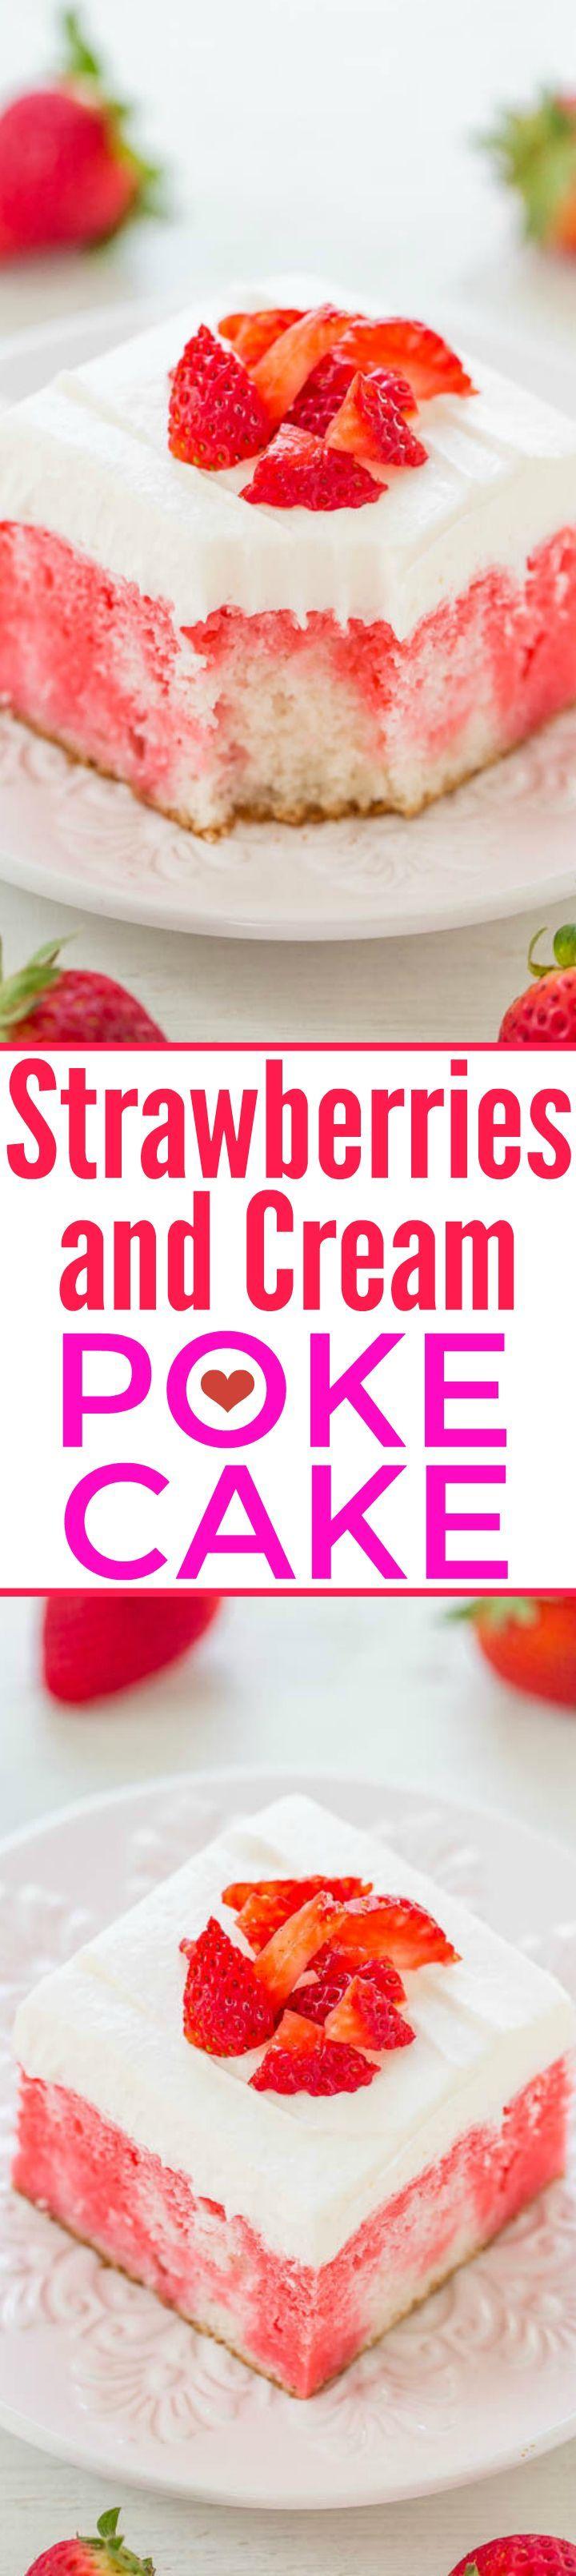 Averie Cooks Strawberries and Cream Poke Cake - Averie Cooks